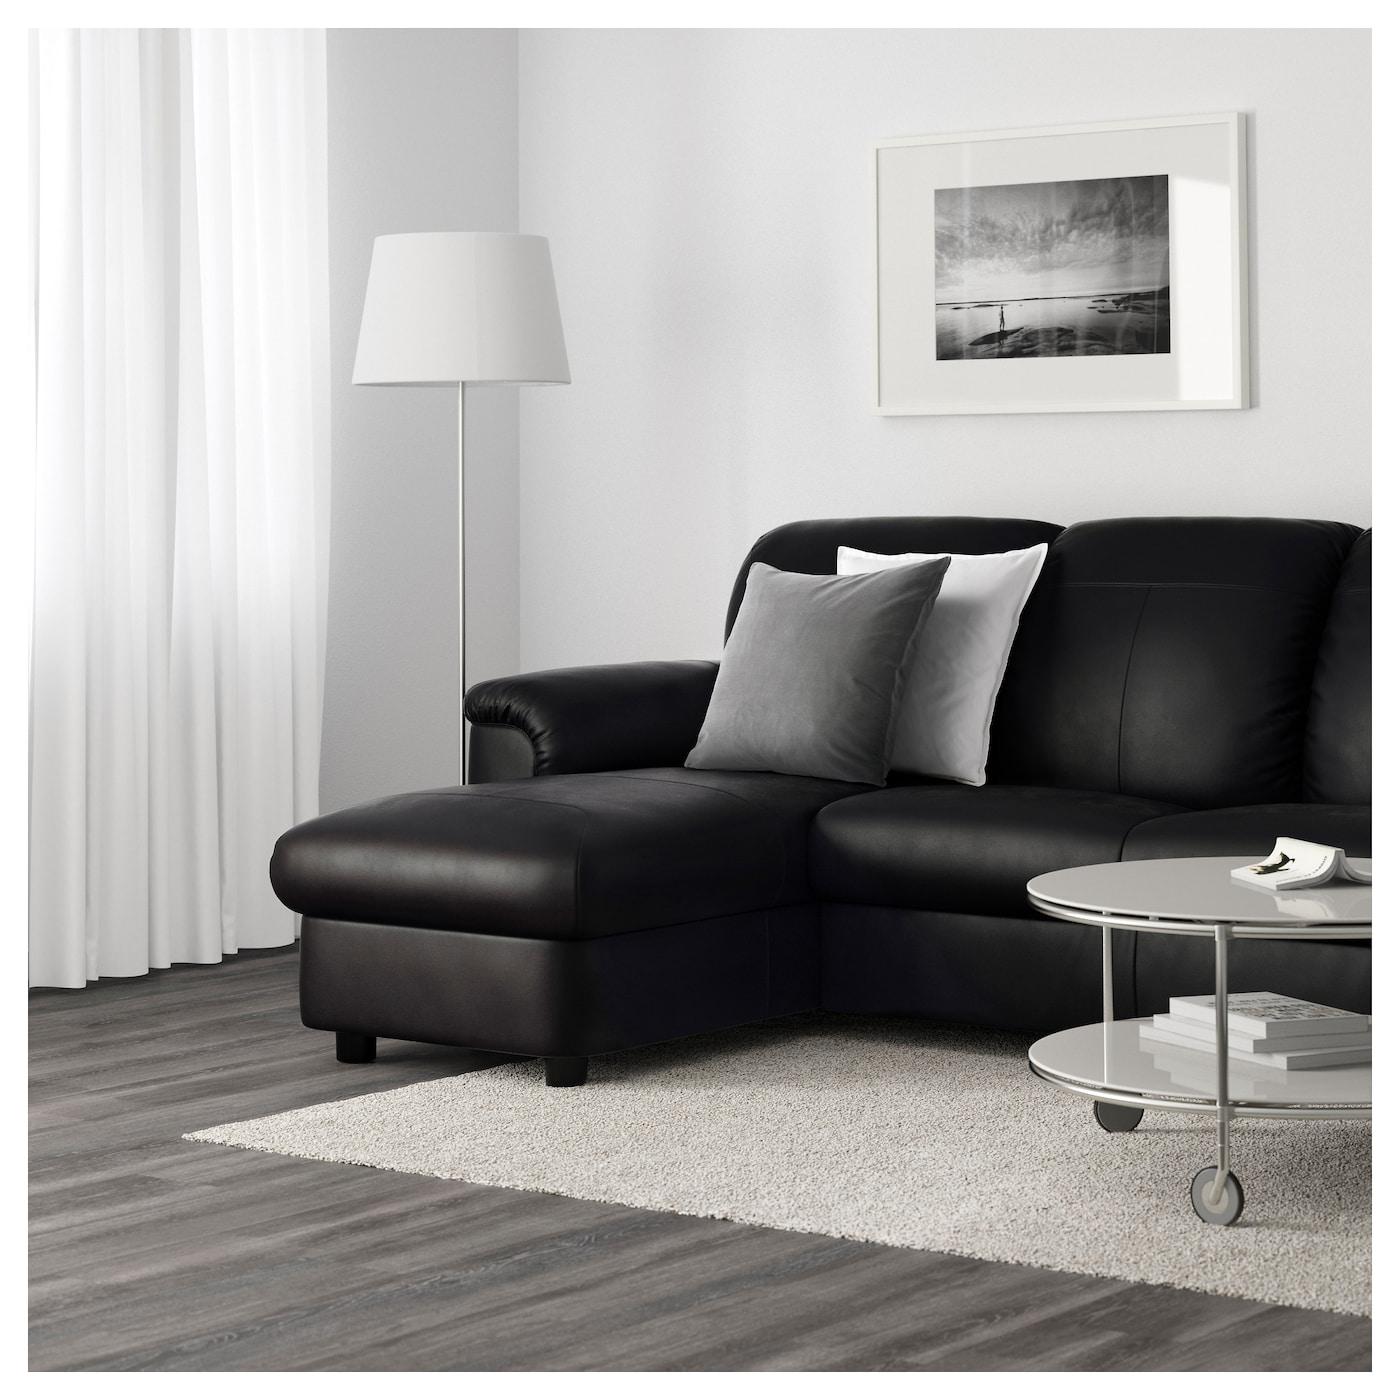 TIMSFORS Two seat sofa with chaise longue Mjuk kimstad black IKEA